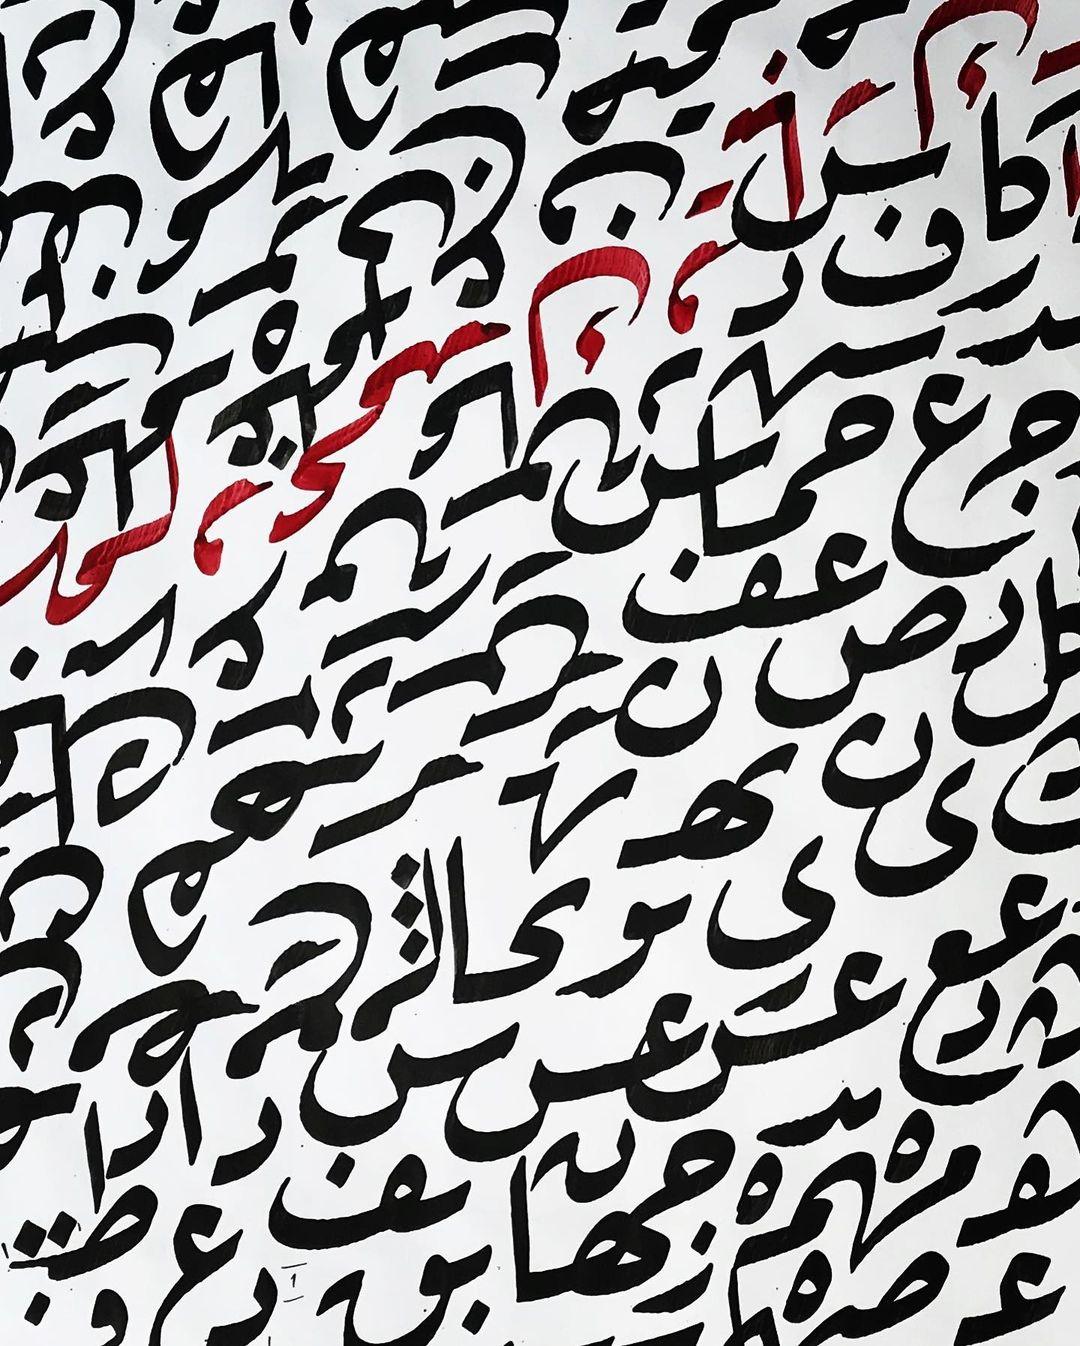 Donwload Photo Mashq #mashq #مشق #exercise #arabiccalligraphy #islamiccalligraphy #tezhip #hüs...- hattat_aa 6